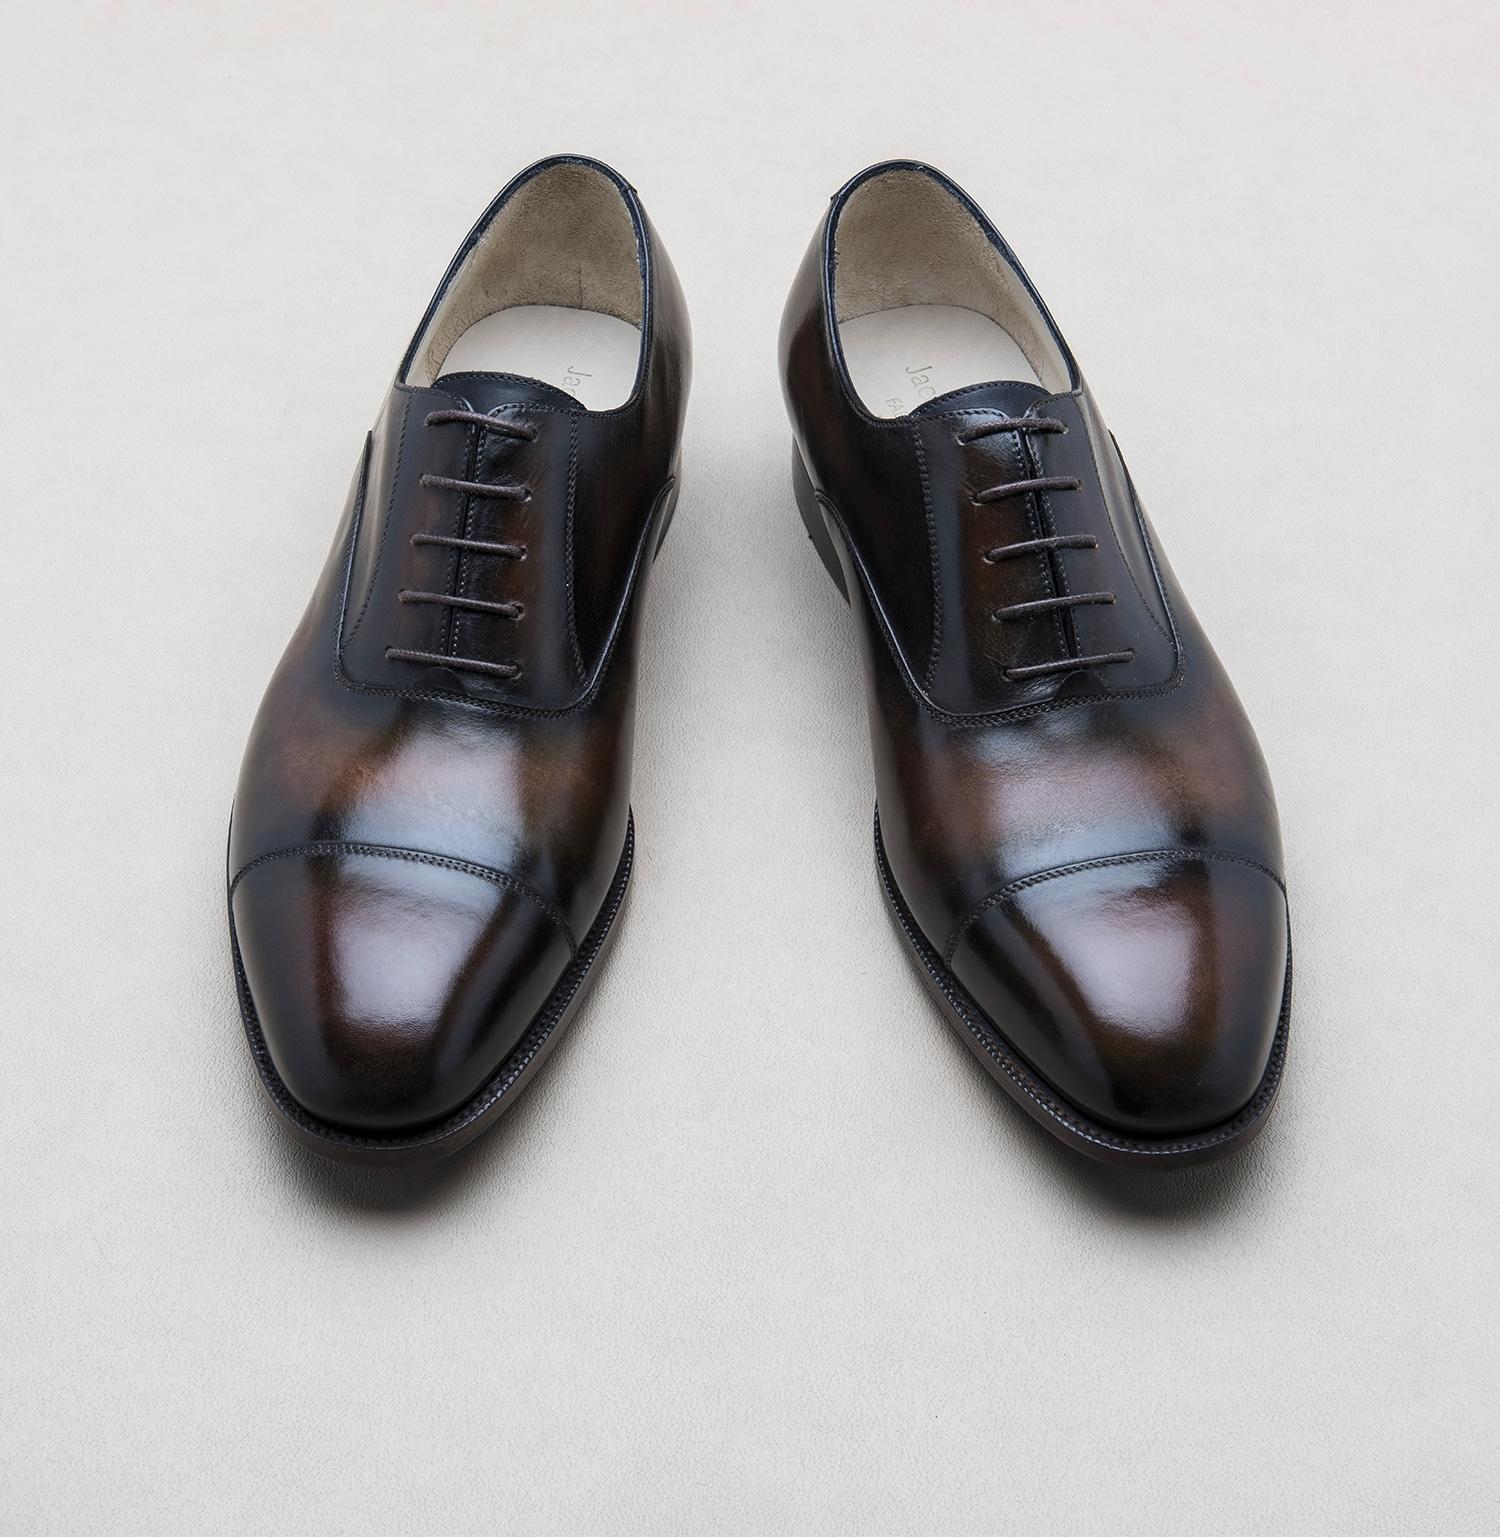 richelieuchene - La chaussure richelieu : origines et histoire